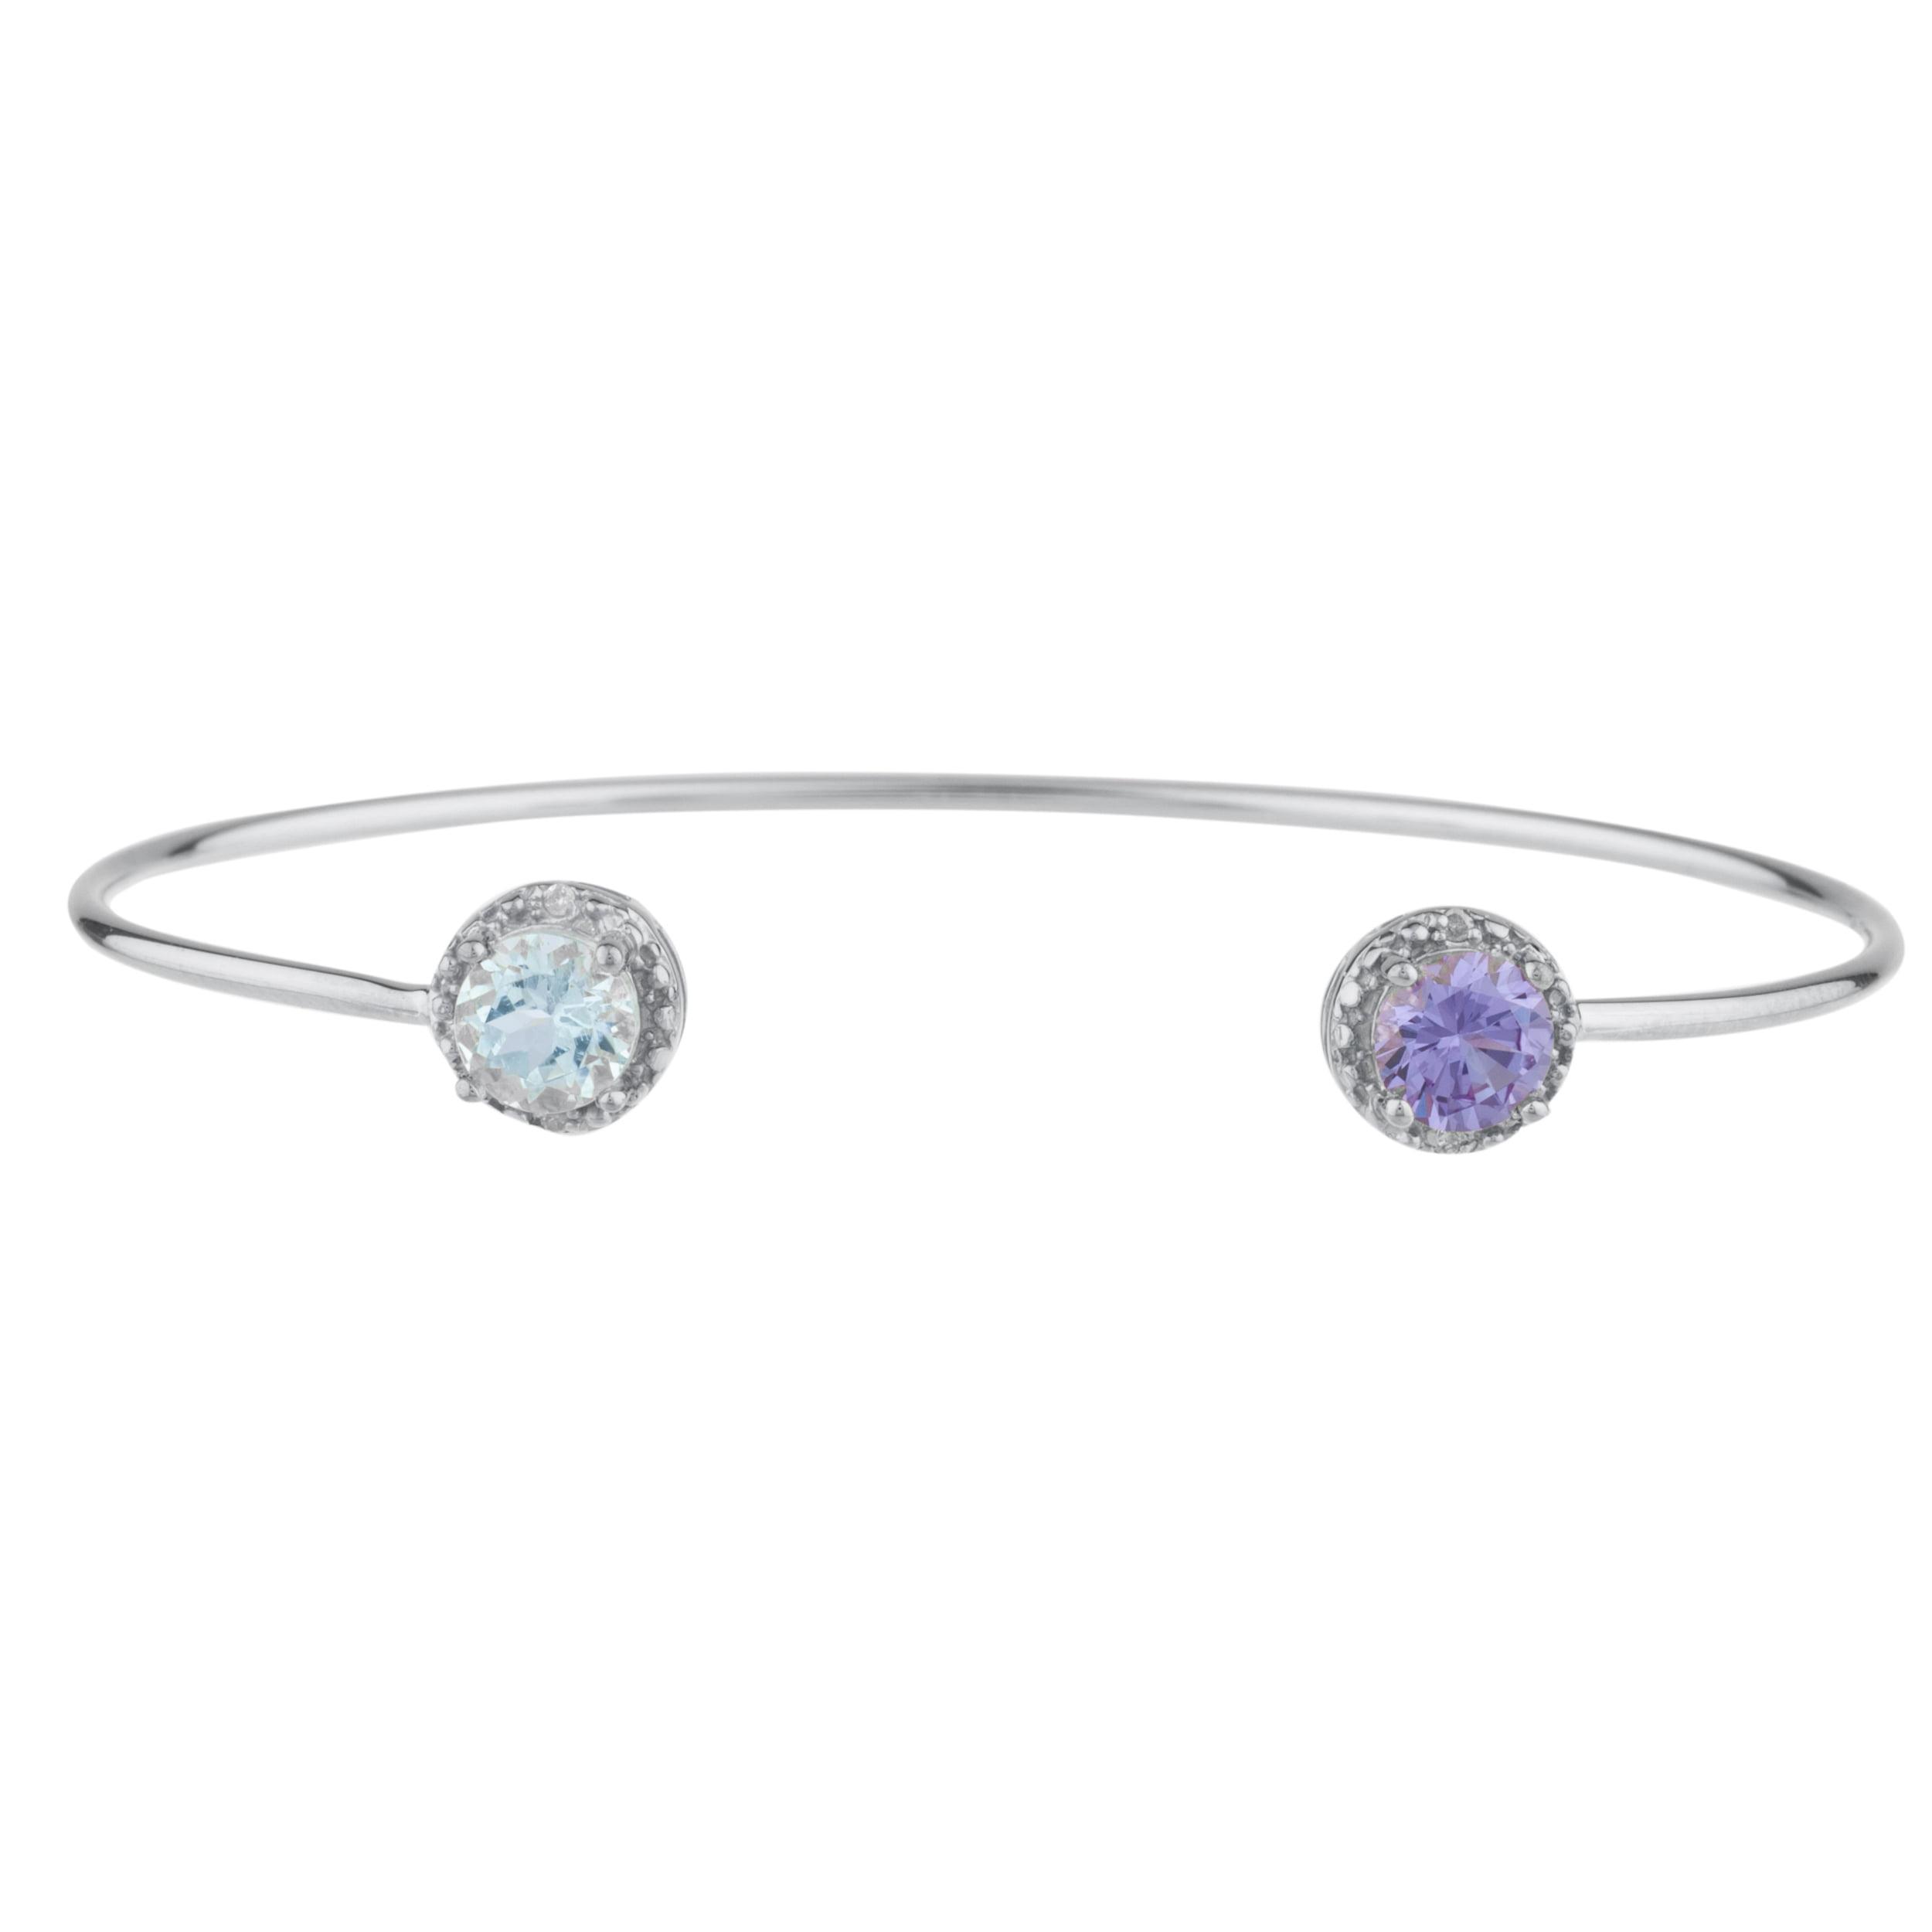 Genuine Aquamarine & Alexandrite Diamond Bangle Round Bracelet .925 Sterling Silver Rhodium Finish by Elizabeth Jewelry Inc